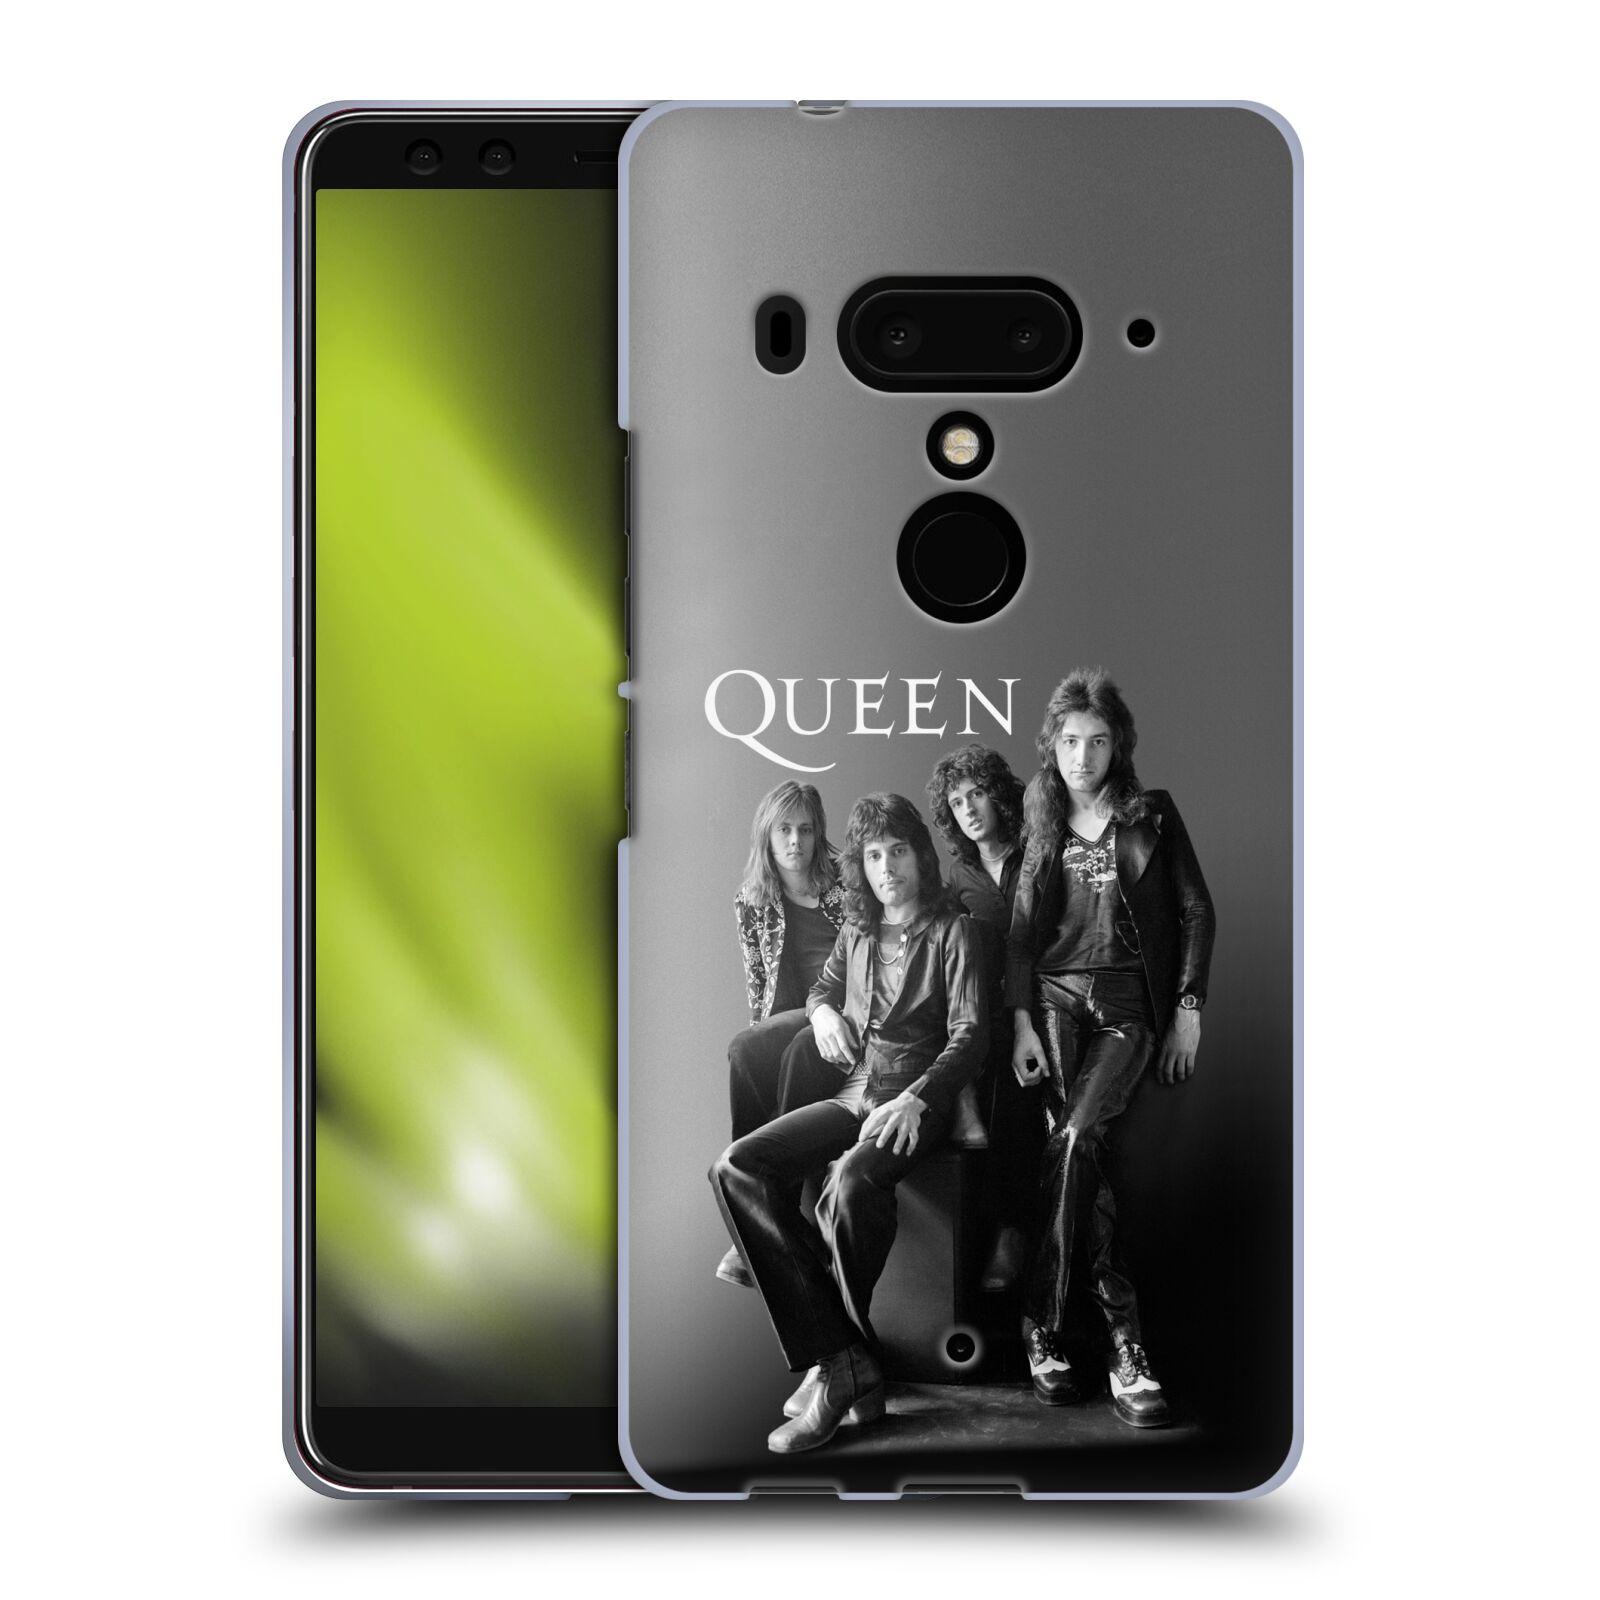 Silikonové pouzdro na mobil HTC U12 Plus - Head Case - Queen - Skupina